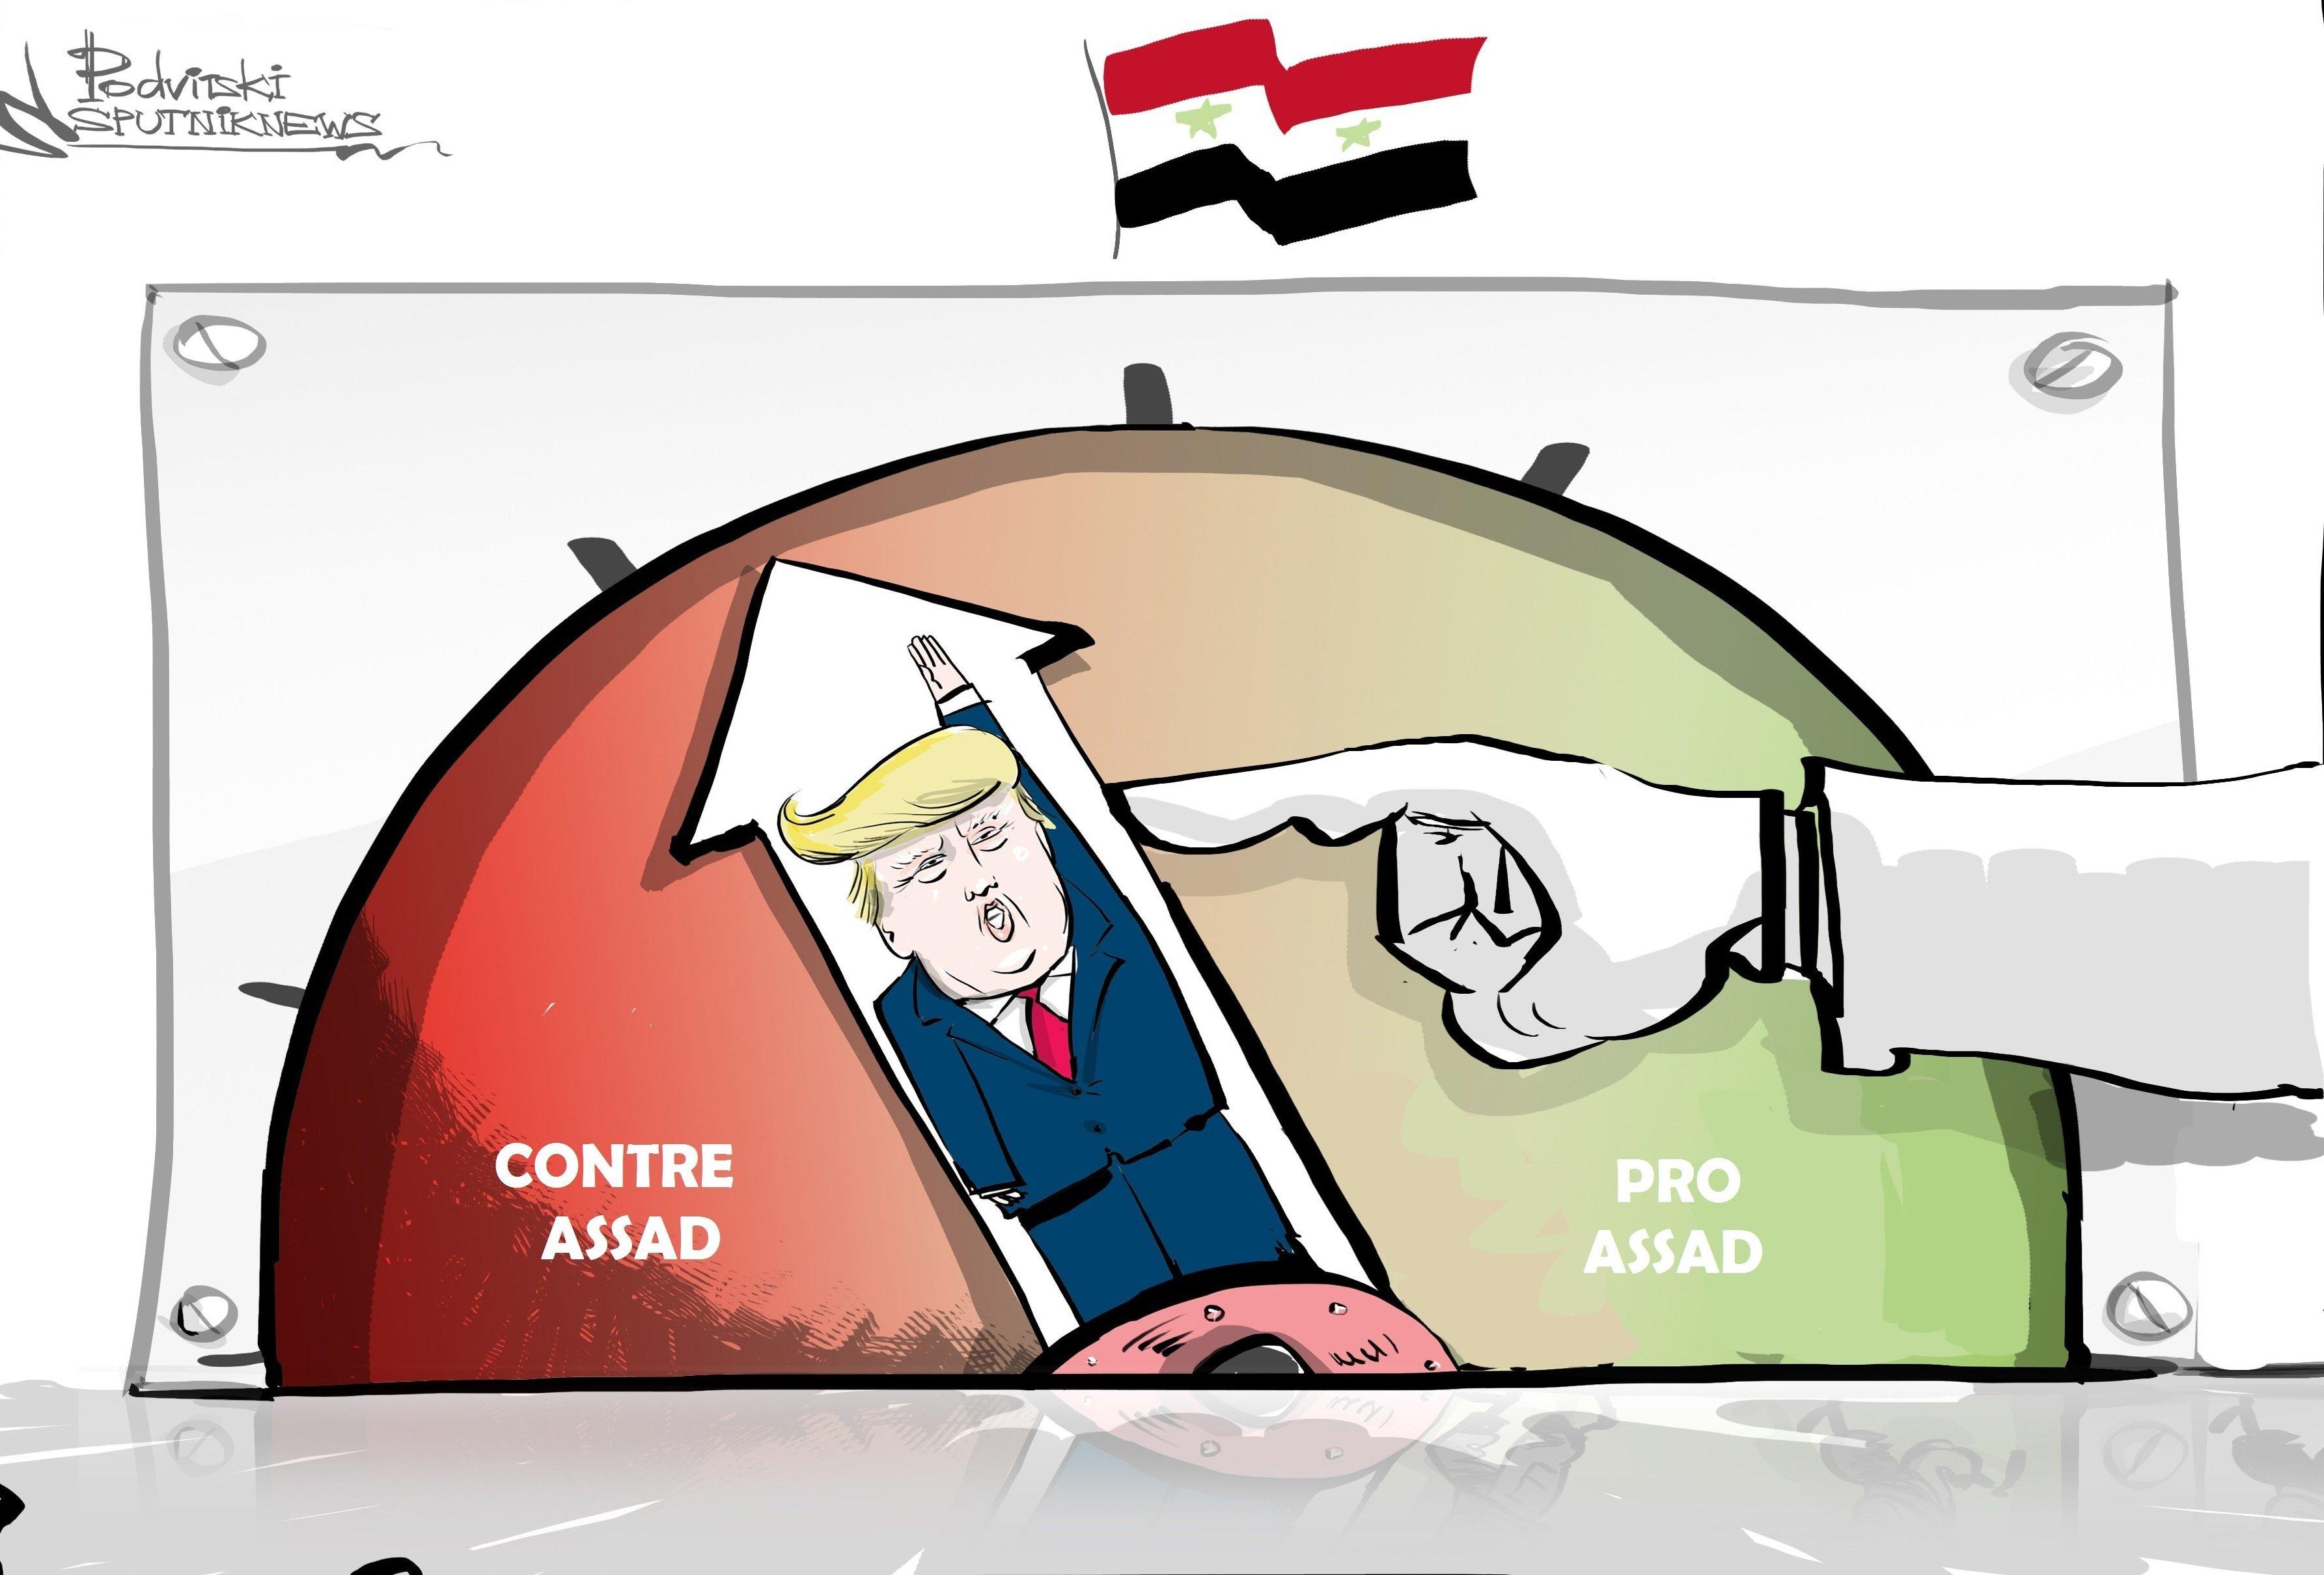 Attaque chimique en Syrie: Donald Trump accuse Bachar al-Assad